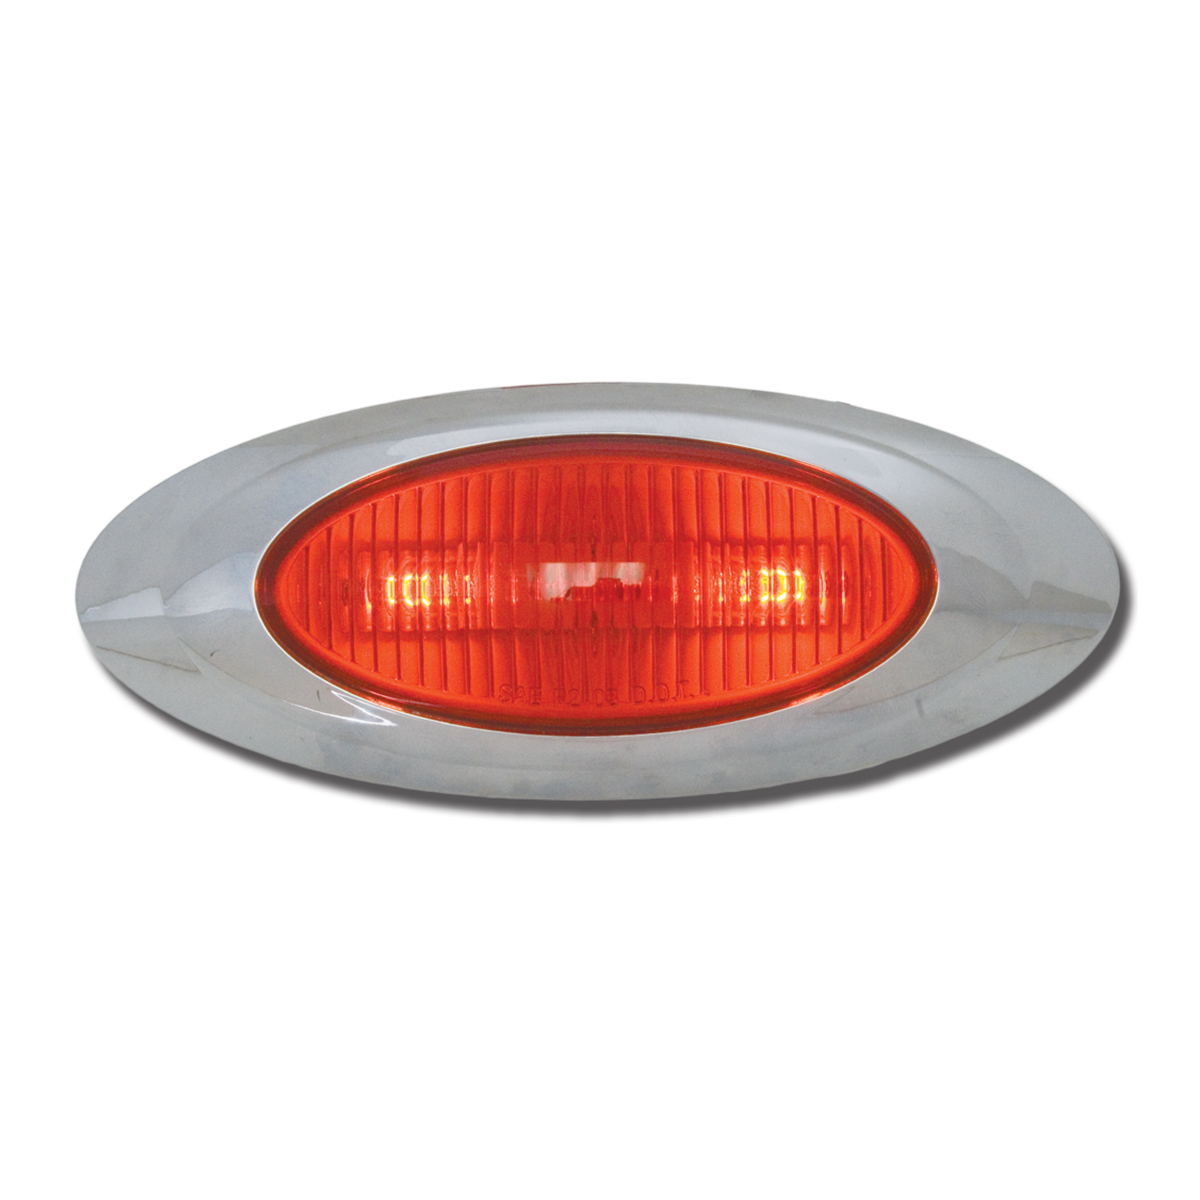 #77645 Plug In Y2K Marker Red Light - 2 Bulbs